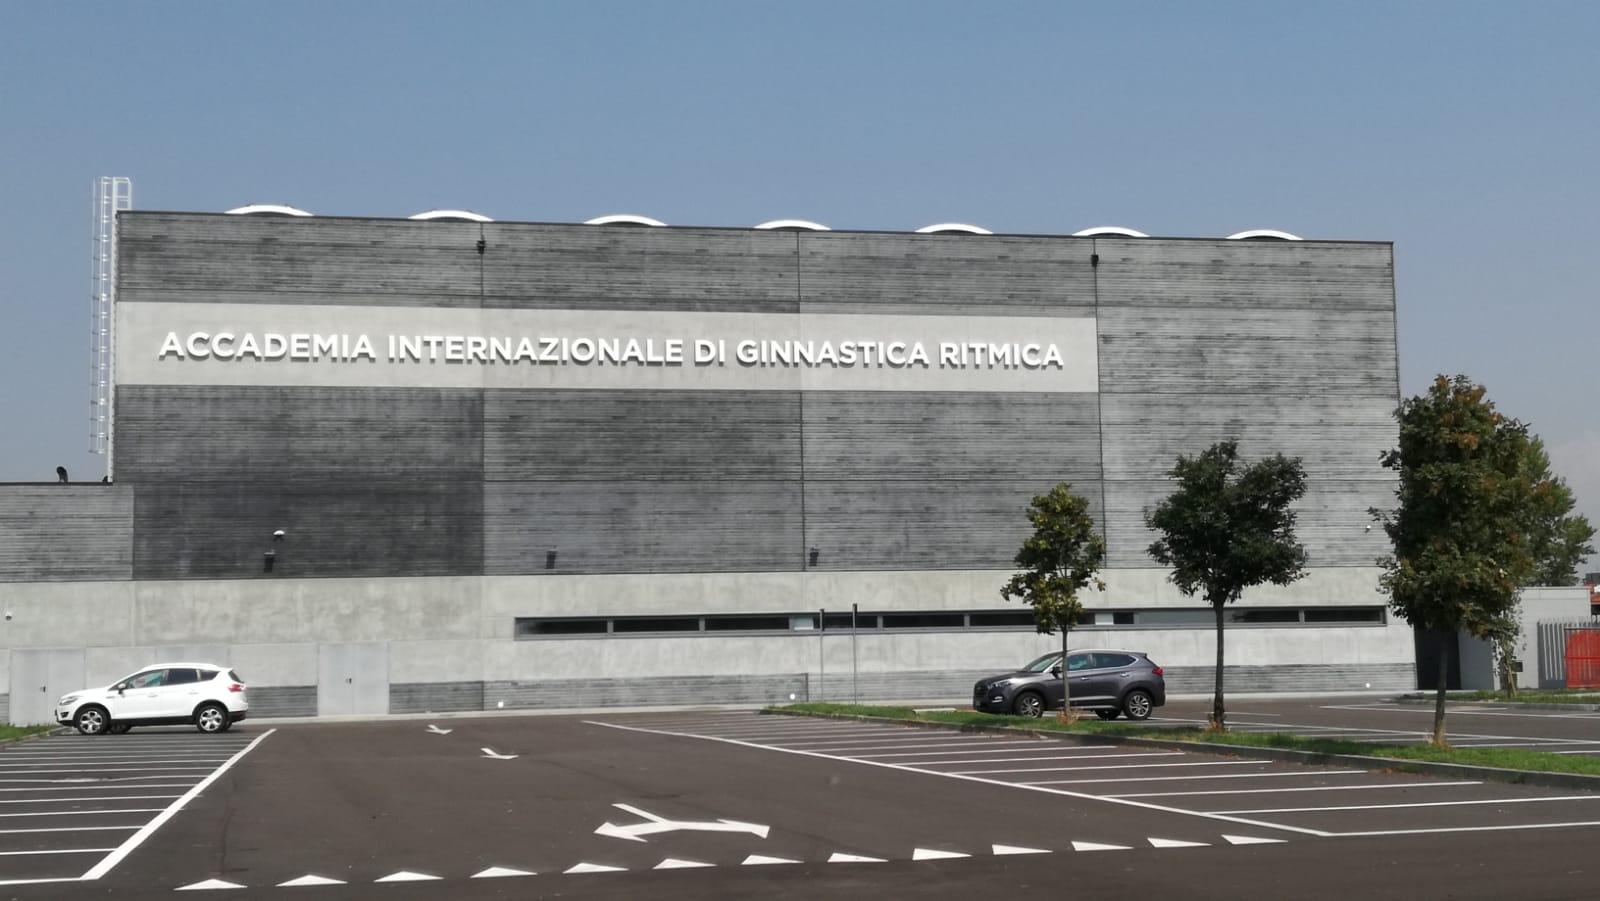 Accademia Internazionale di Ginnastica Ritmica